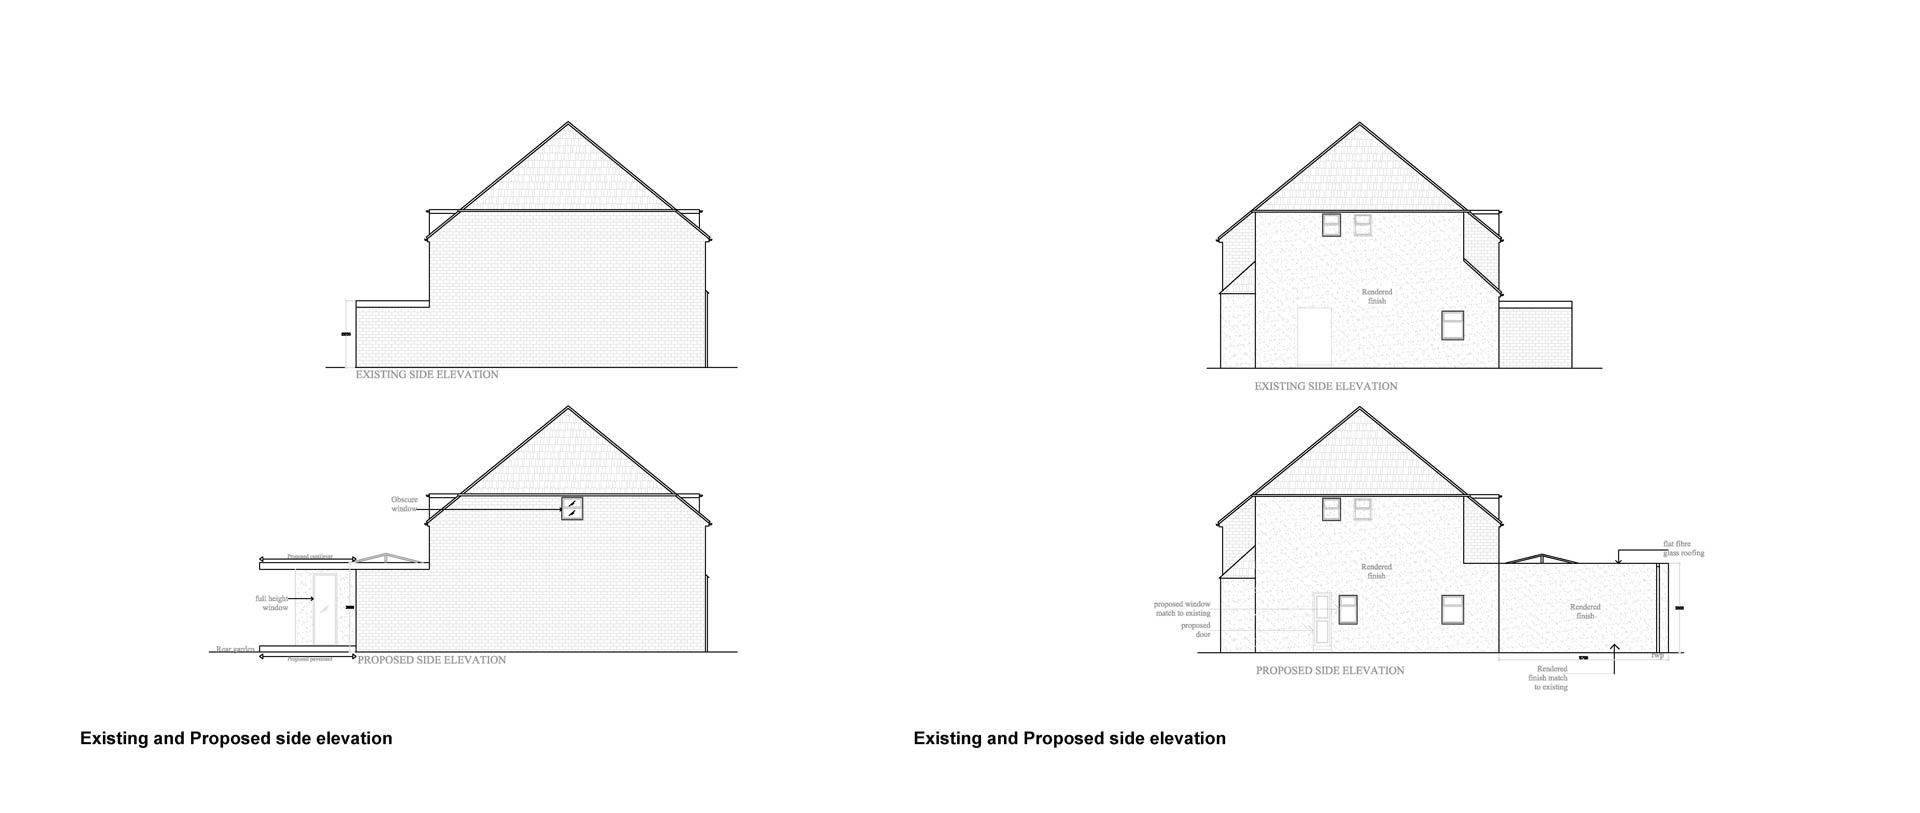 Surrey-council-Side-Elevation